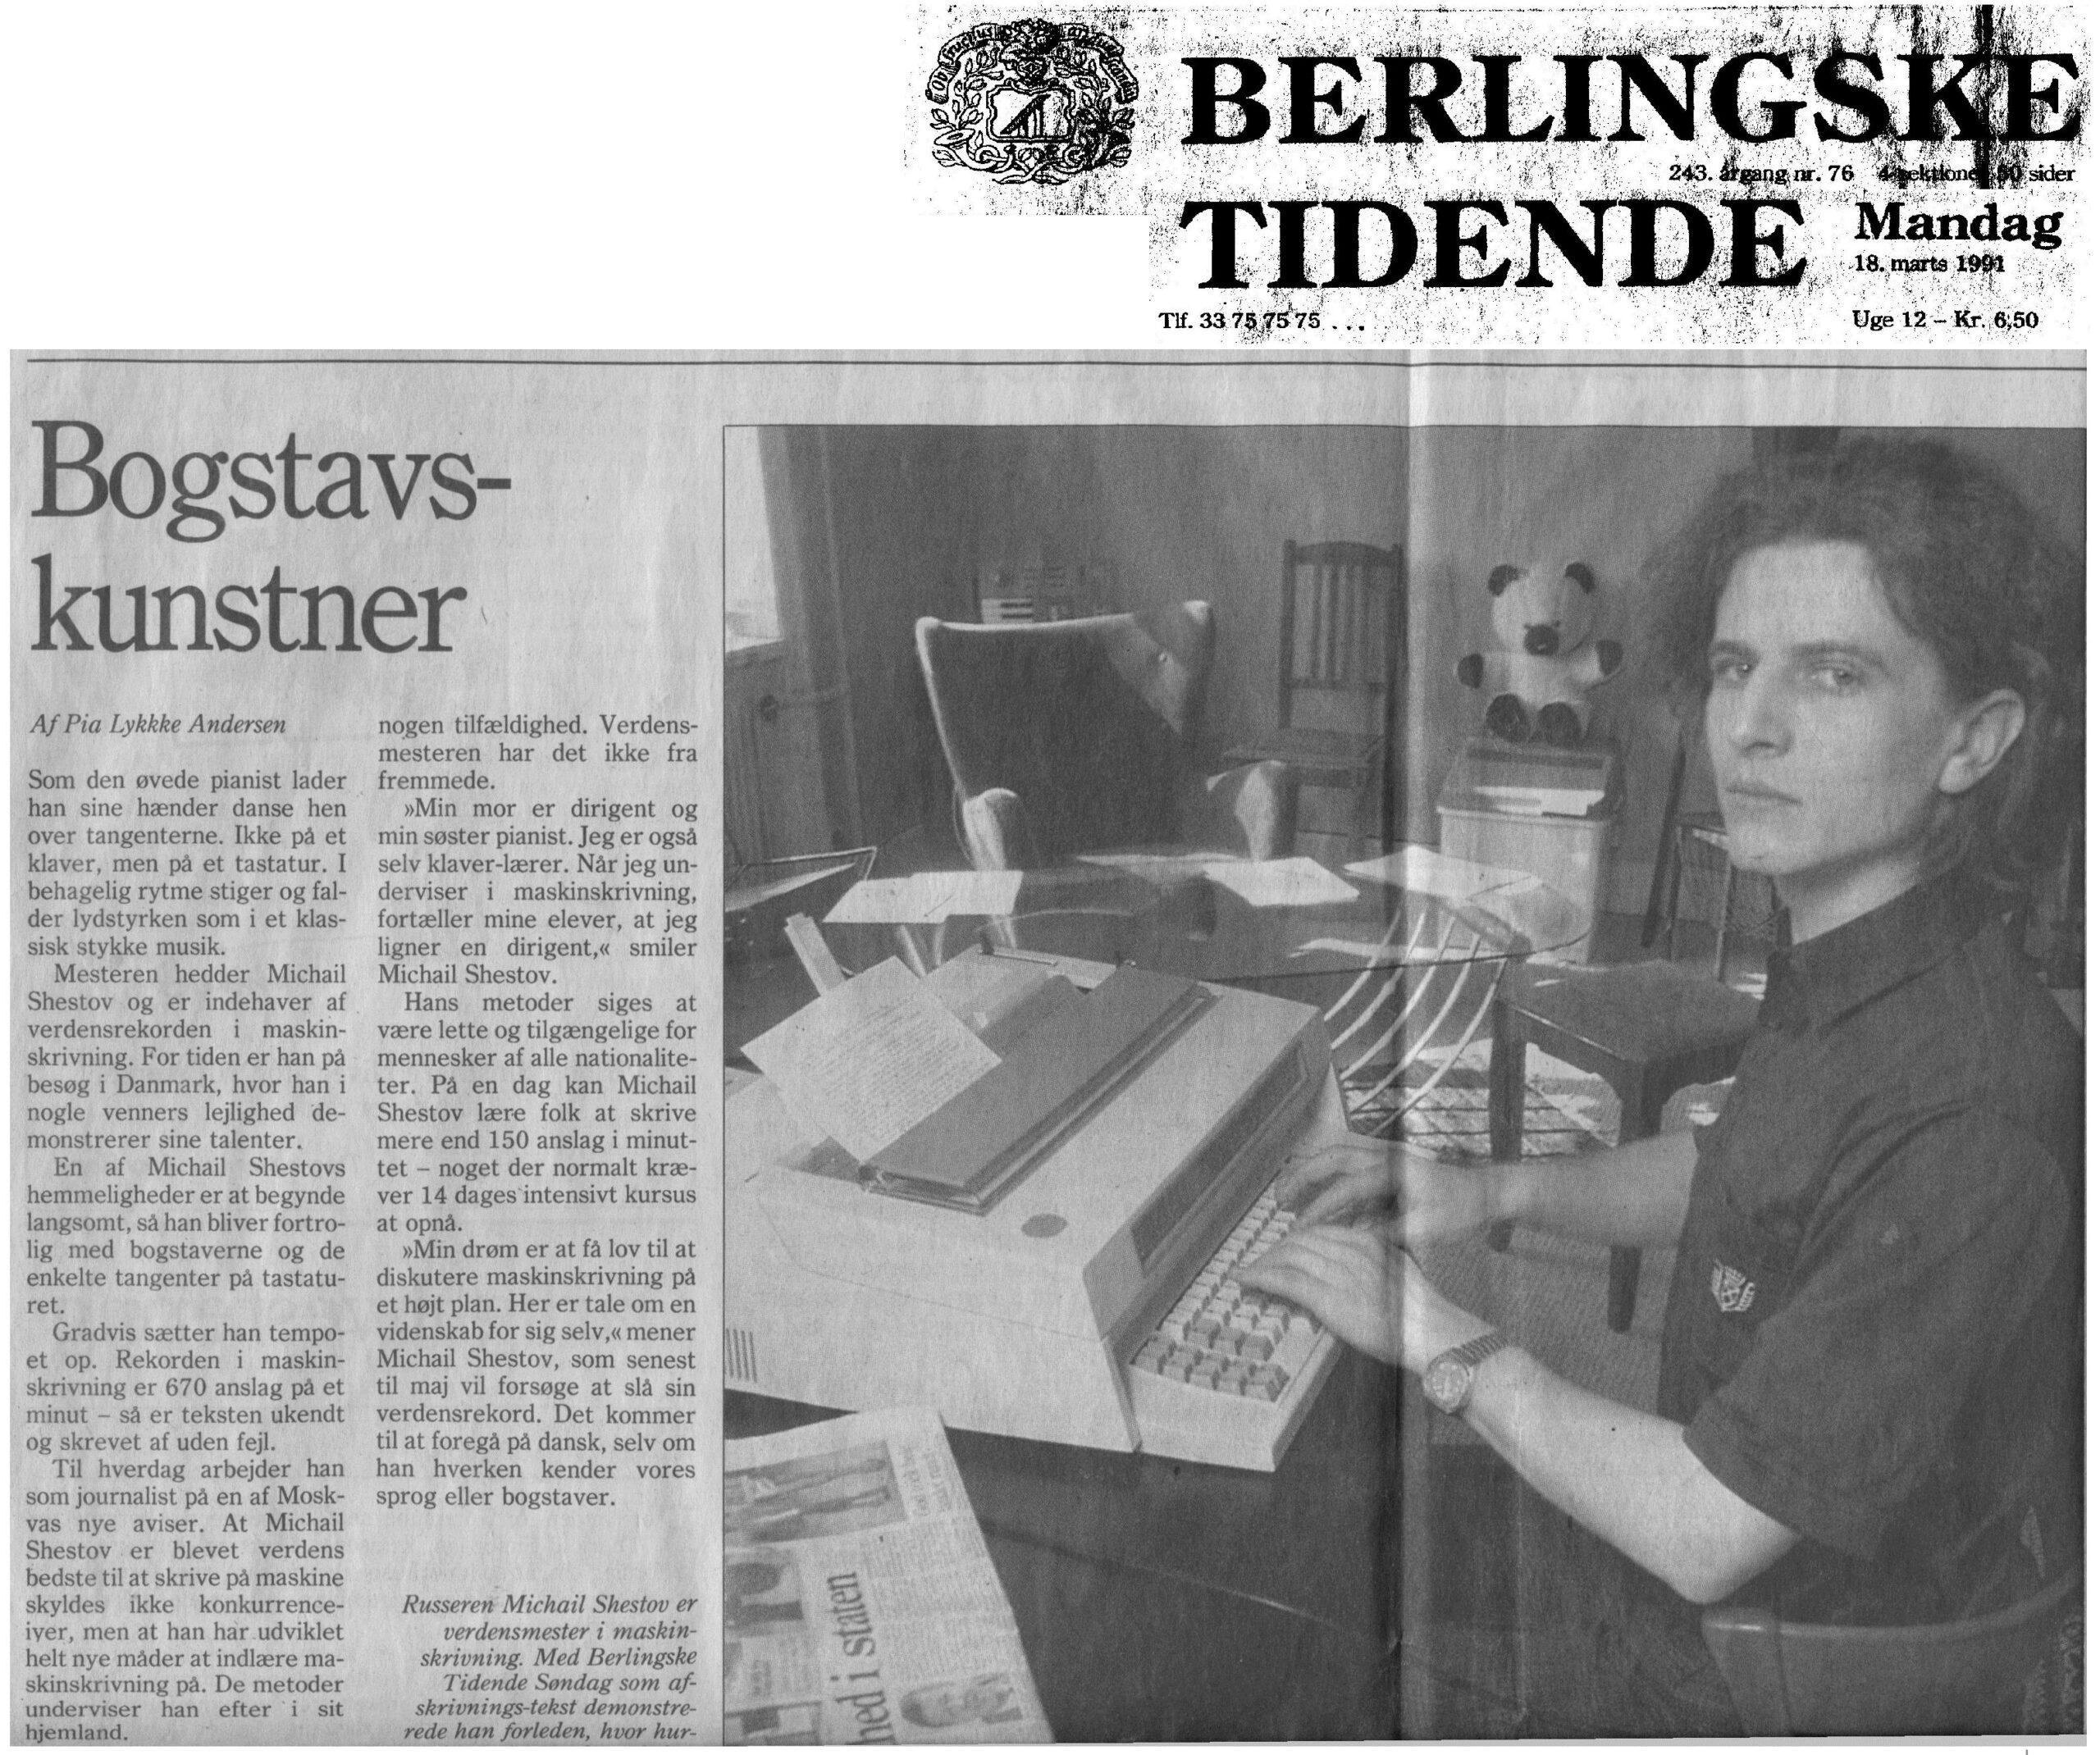 Berlingske tidende, 1991